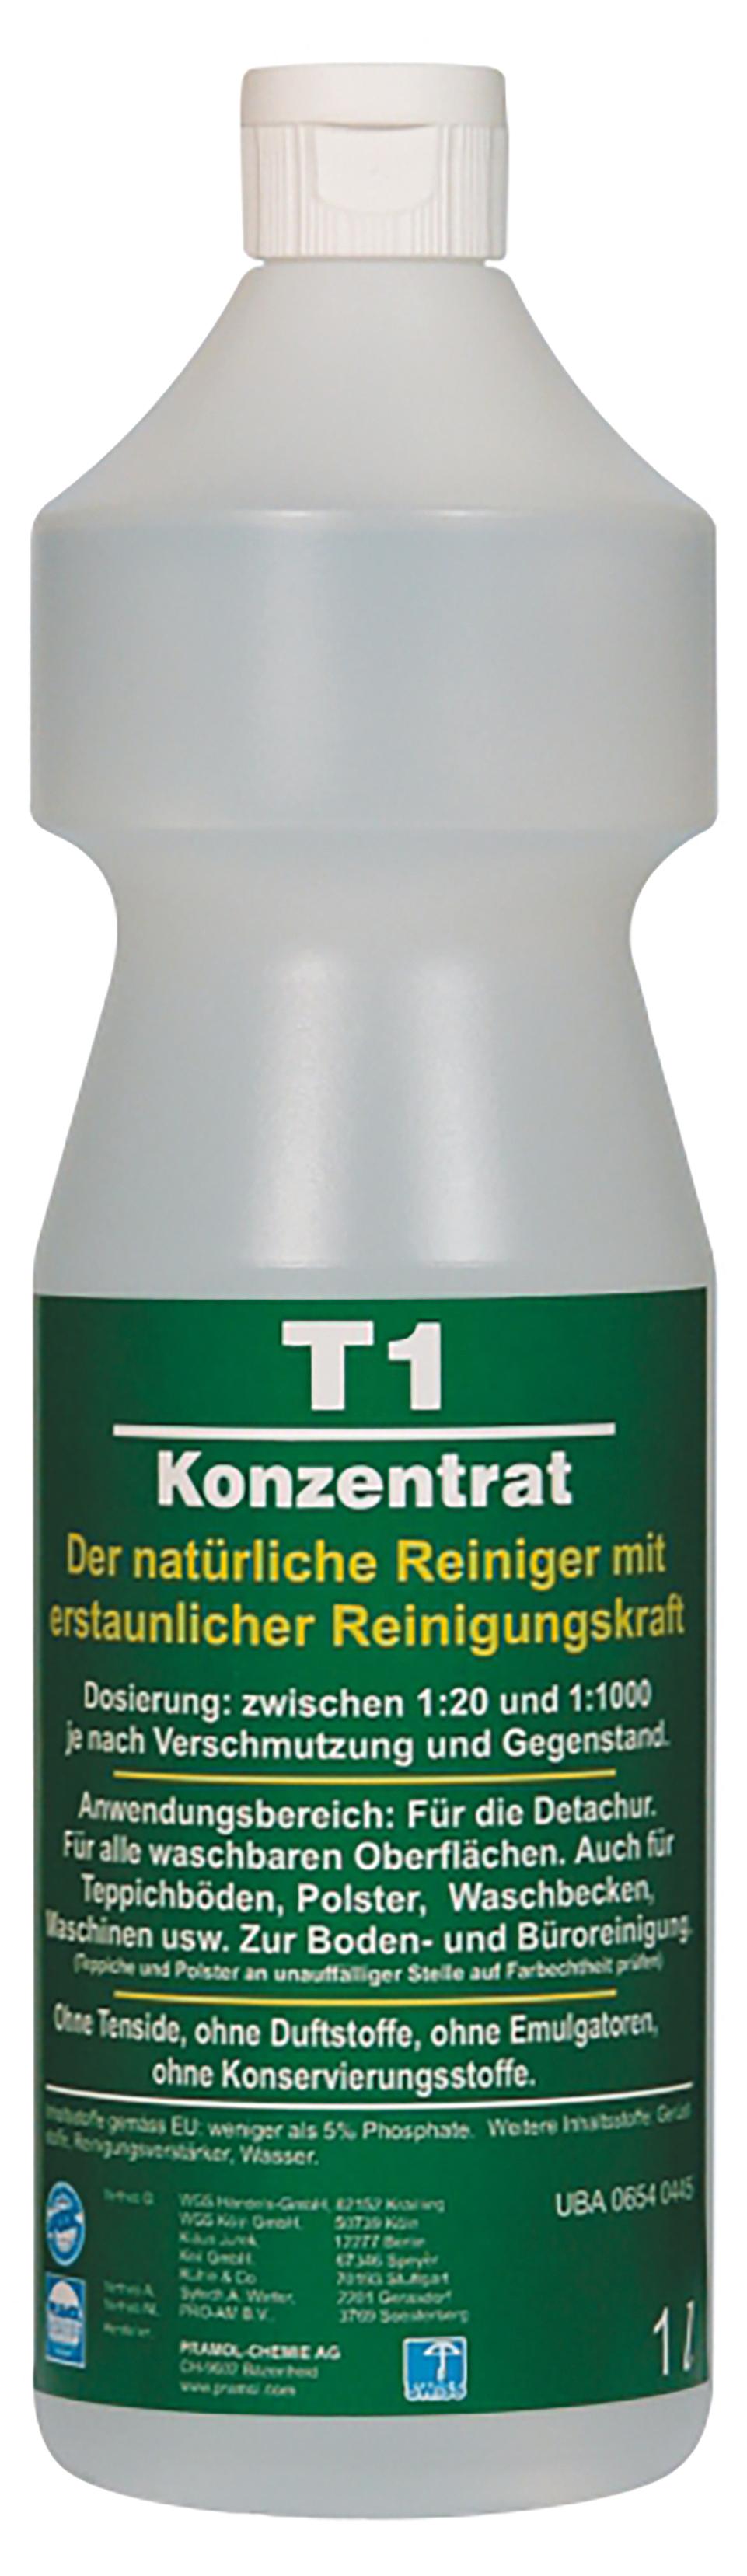 T1 Konzentrat, tensidfreier Reiniger, 1 Flasche, 1 Liter